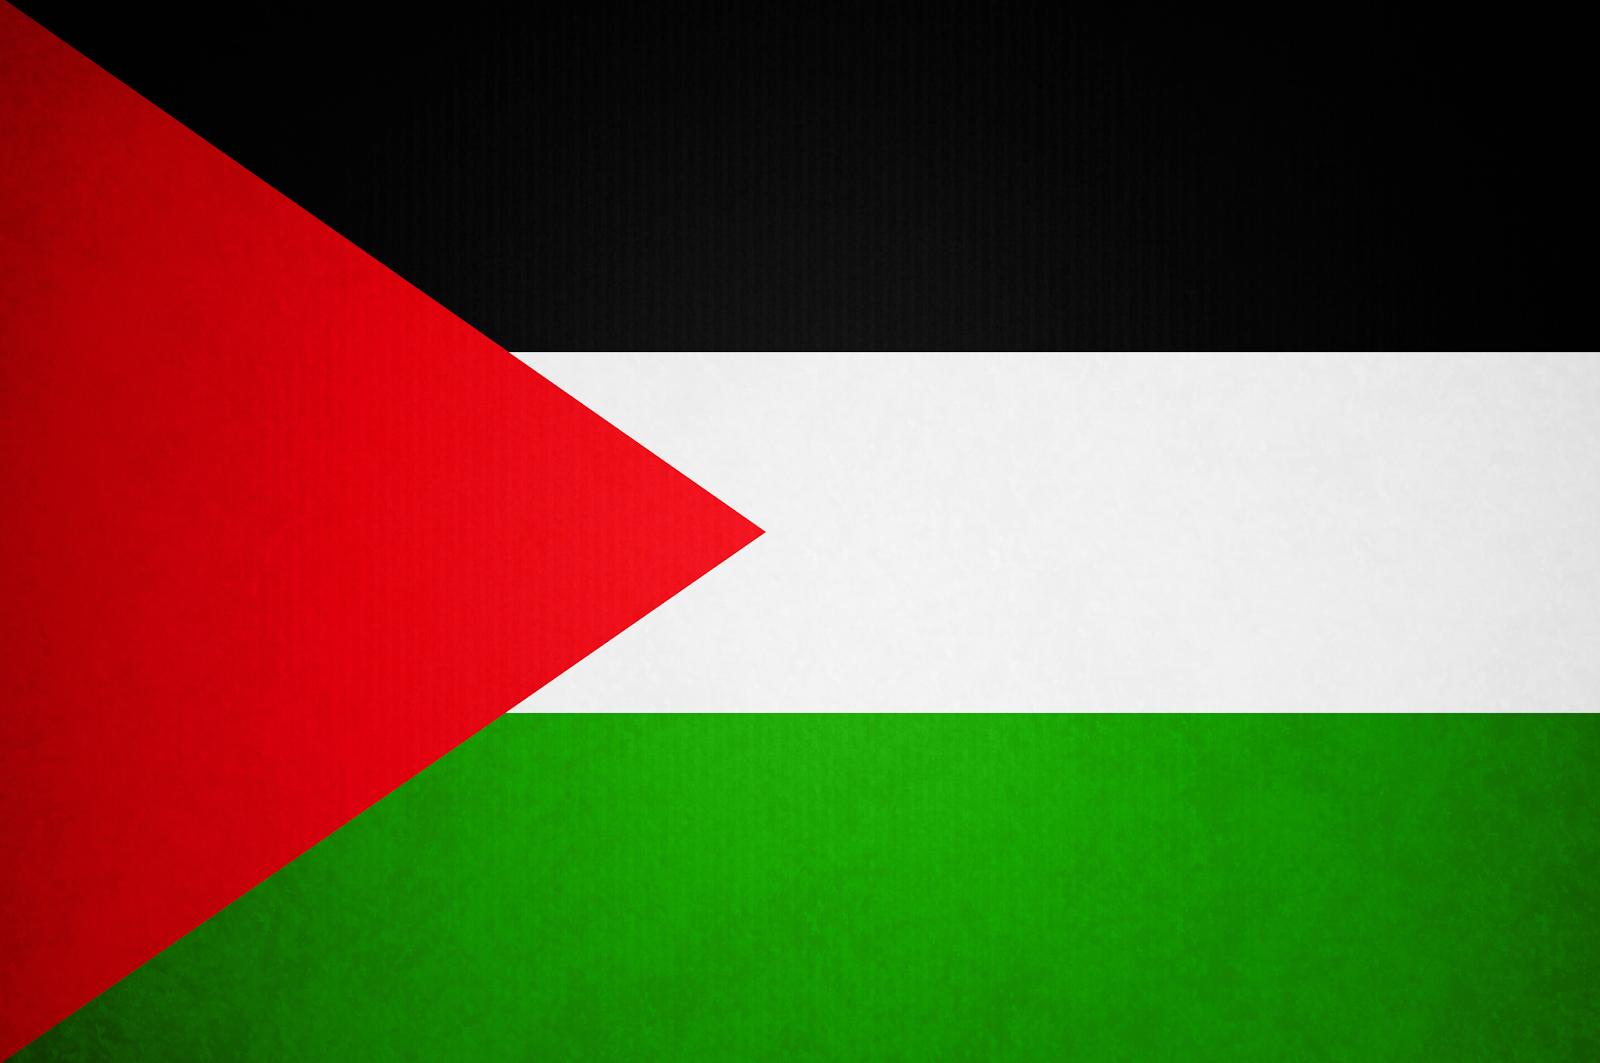 Palestinian Flag Hd Png علم فلسطين - Flag HD PNG